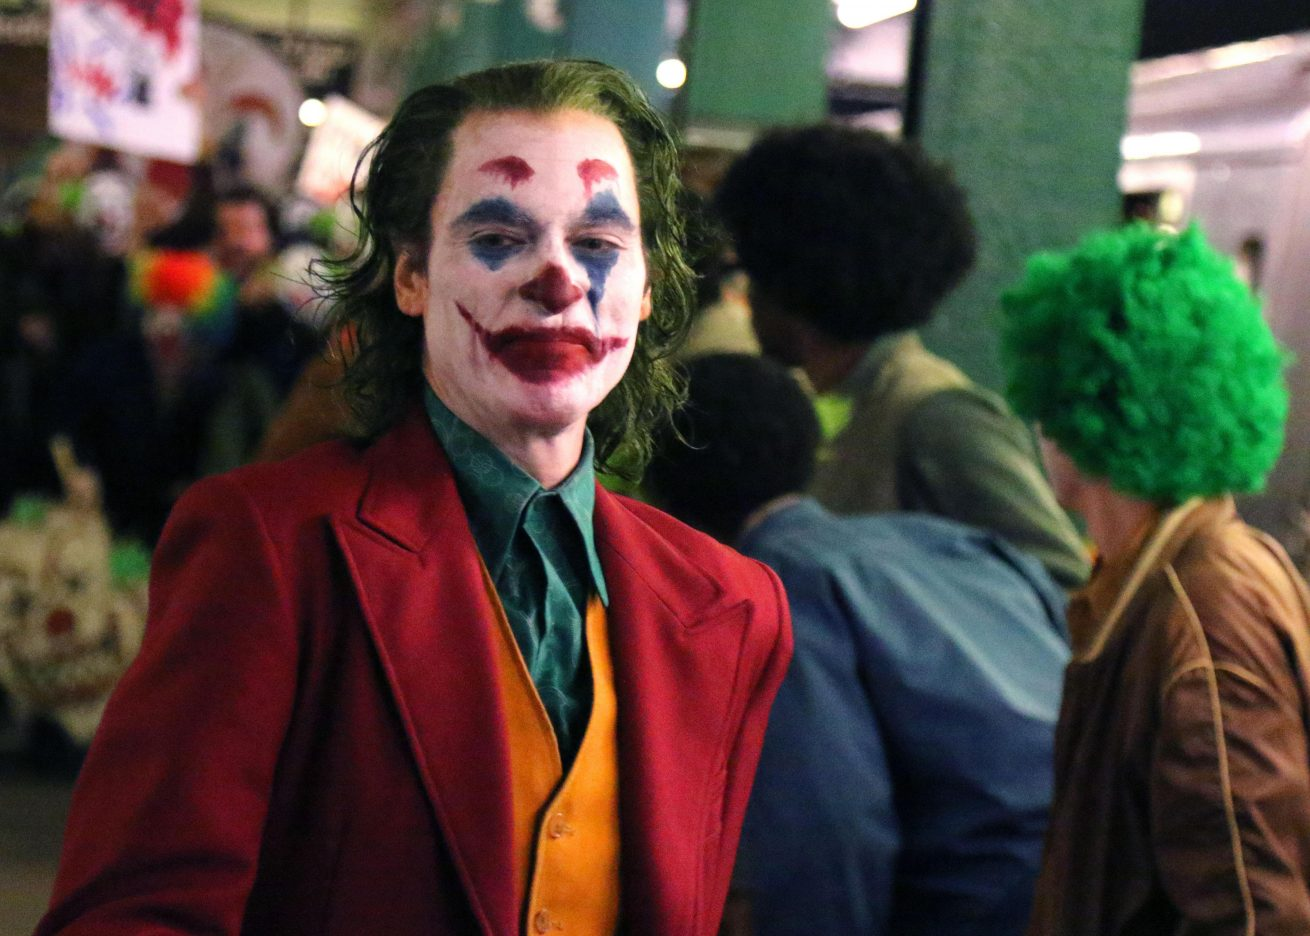 joaquin phoenix'li joker filmi, venedik film festivali'nde en tepede